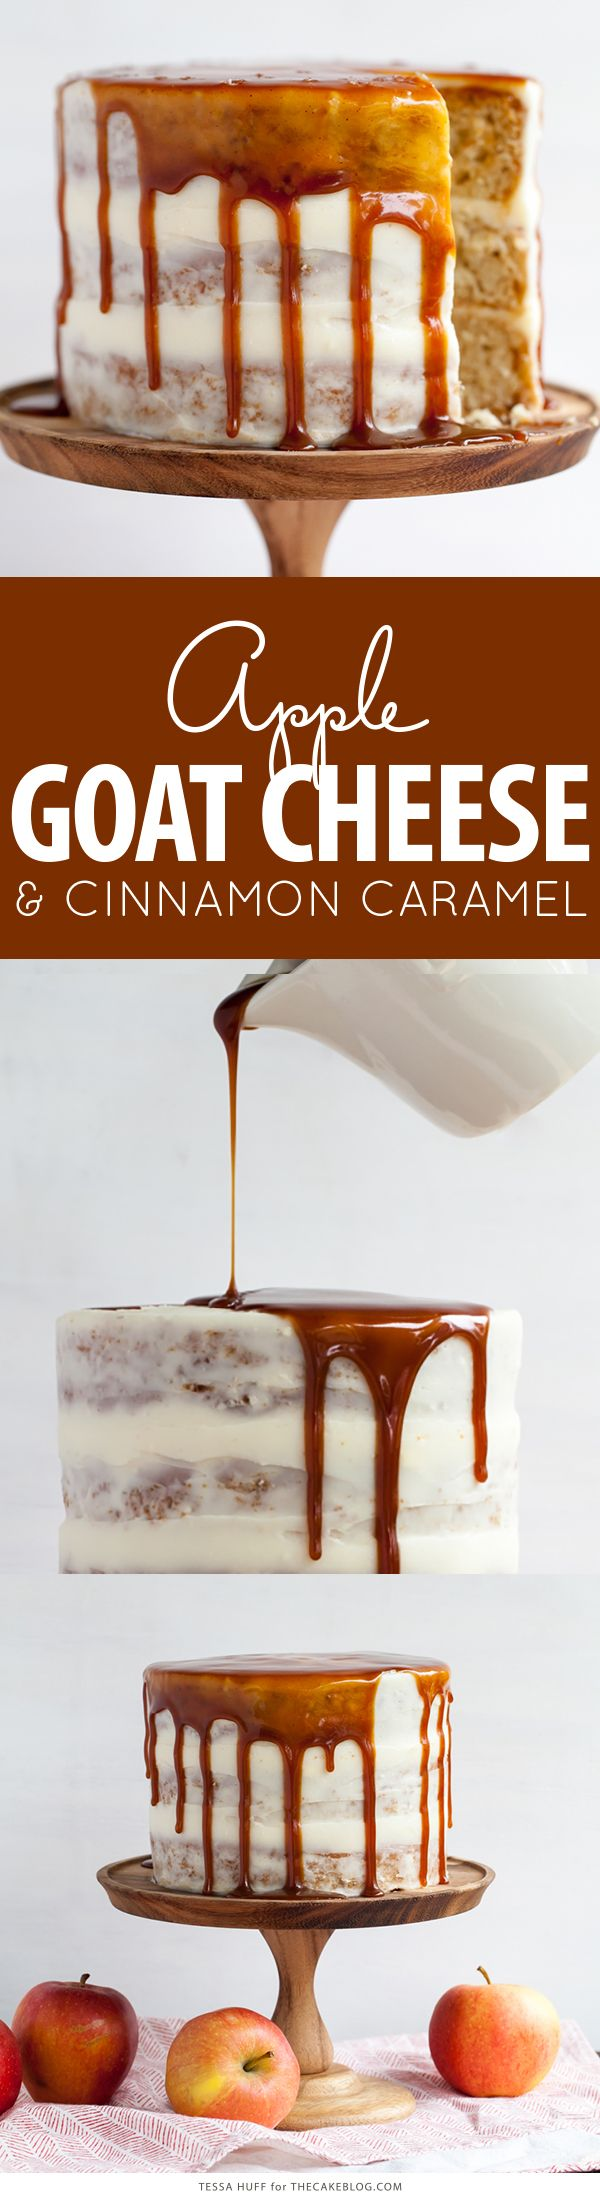 Apple & Goat Cheese Cake Cake recipes, Goat cheese